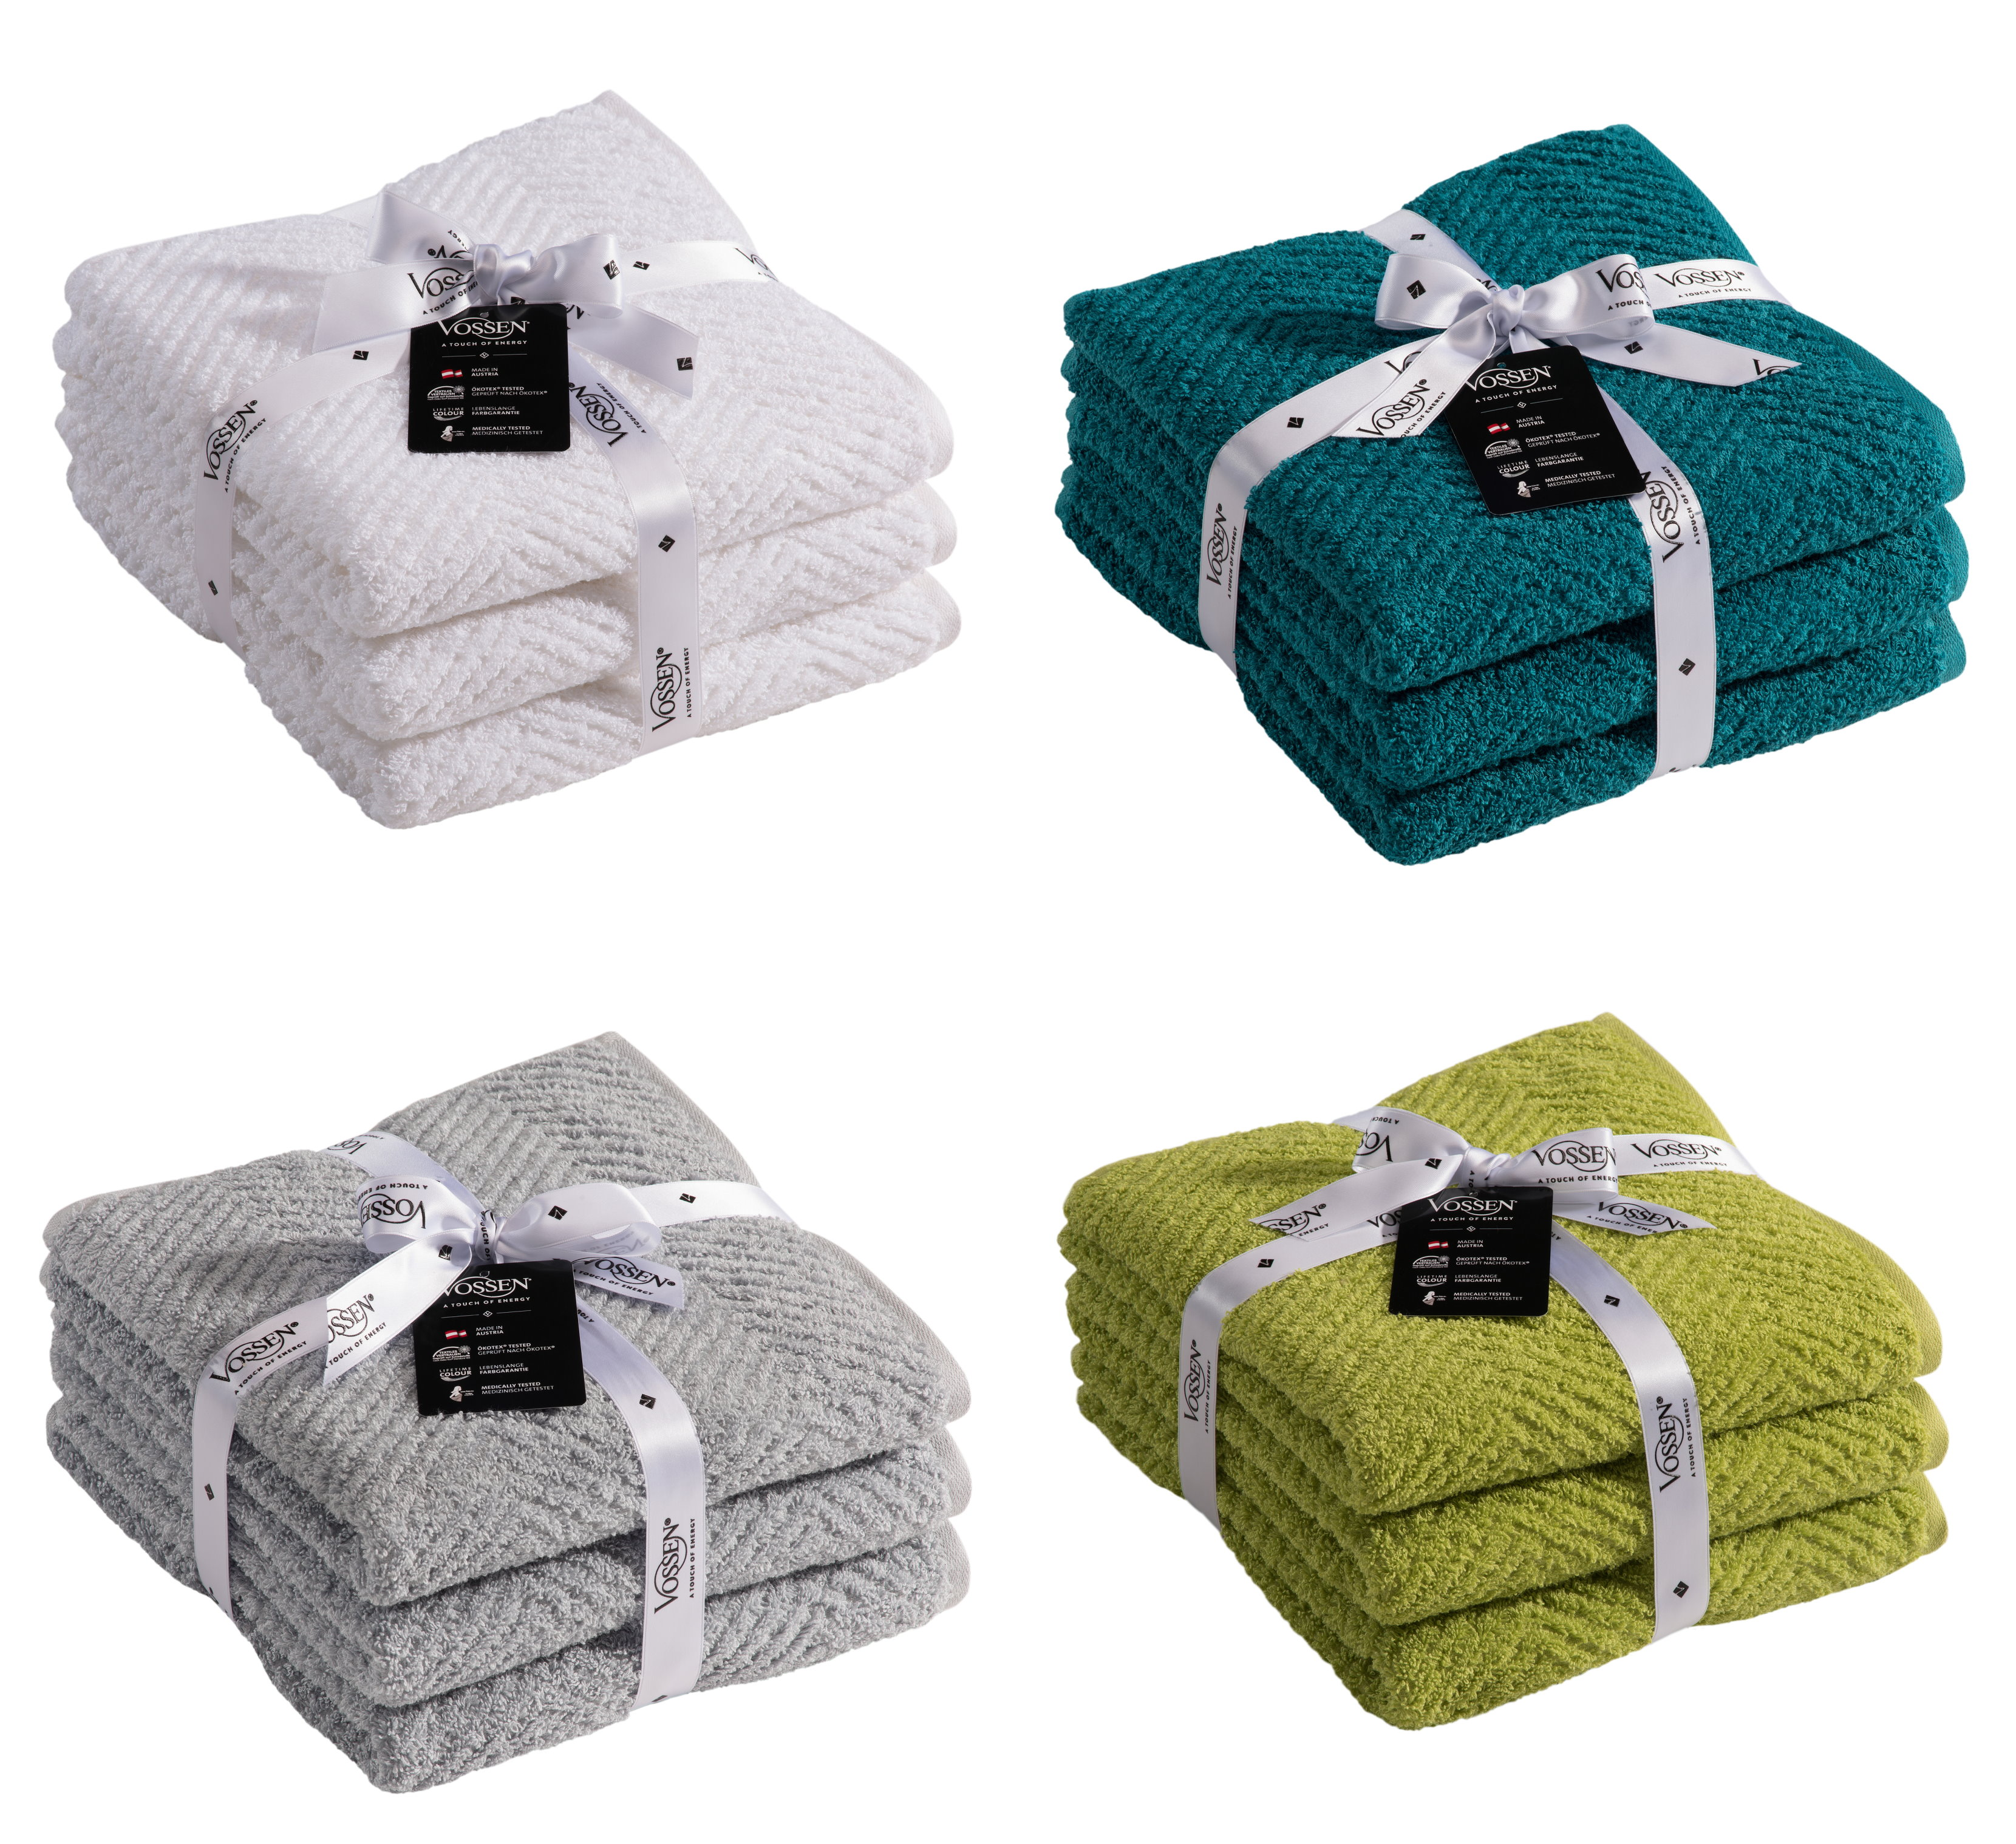 vossen 3er set handt cher handtuch duscht cher g stet cher mississippi ebay. Black Bedroom Furniture Sets. Home Design Ideas